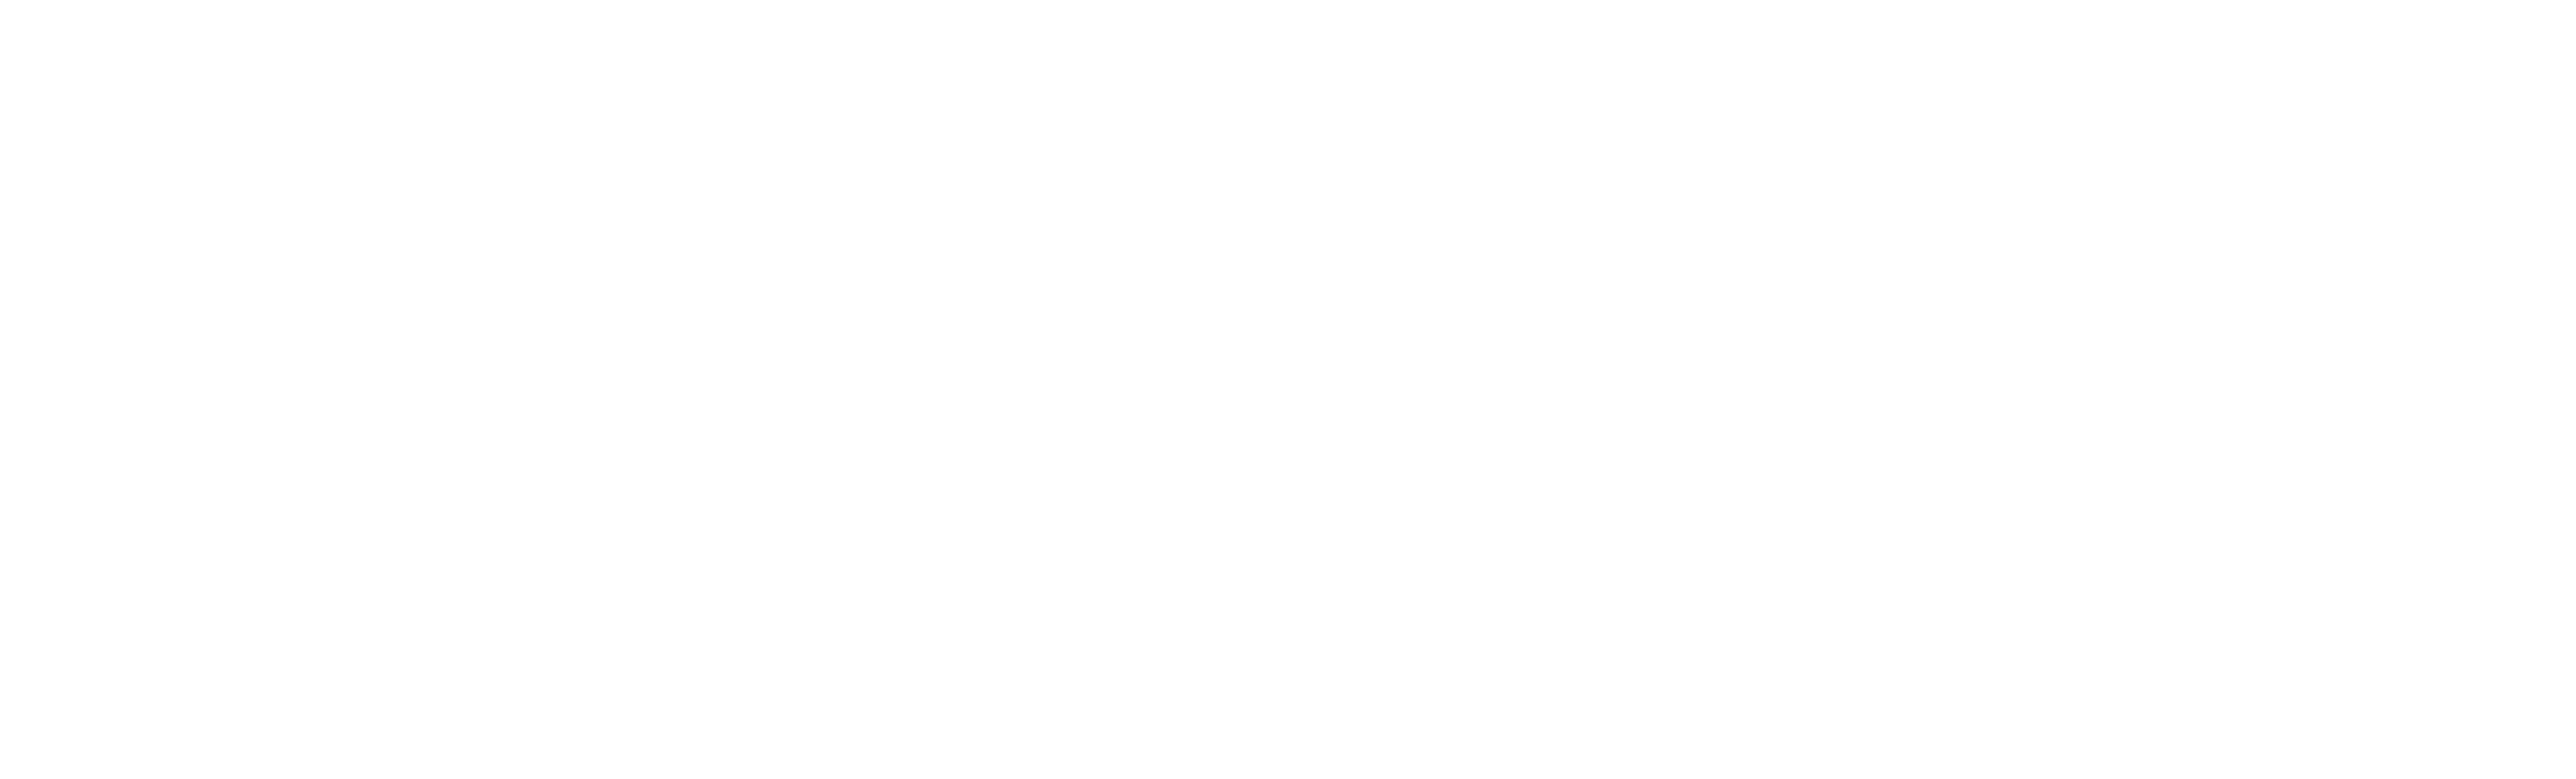 Jason-Aldeans-logo-White (1)